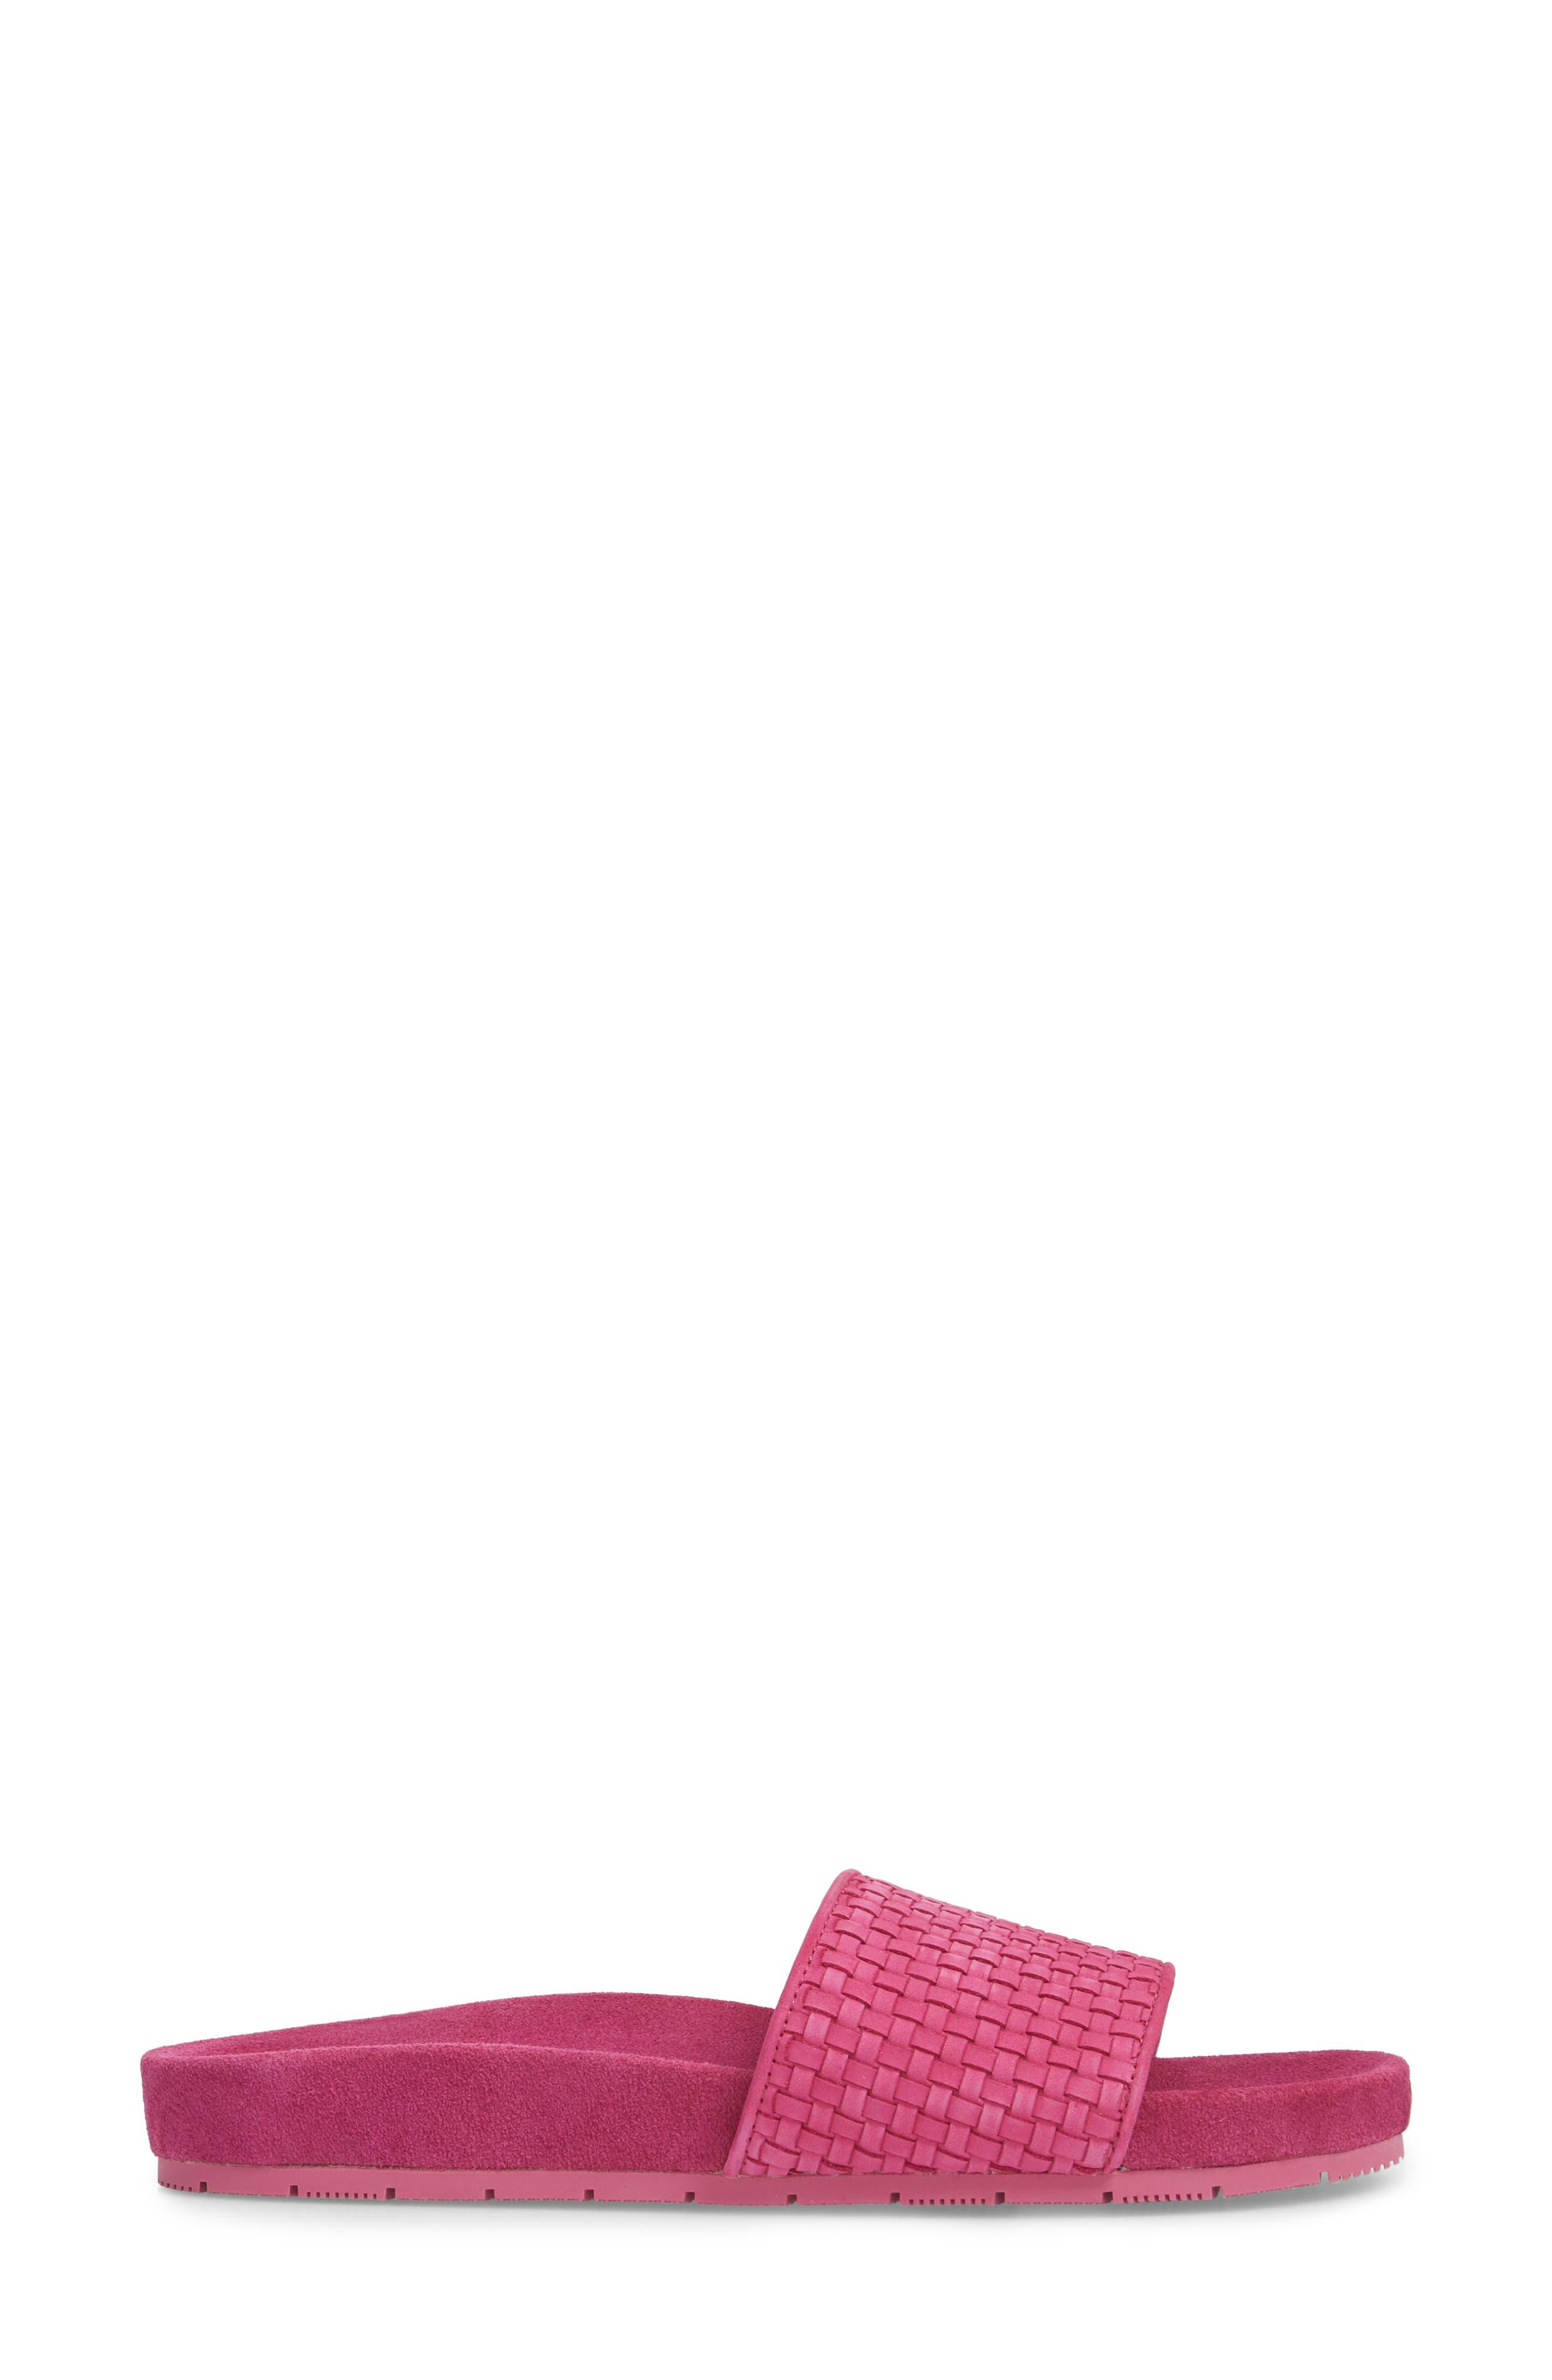 Naomie Slide Sandal,                             Alternate thumbnail 3, color,                             Magenta Suede